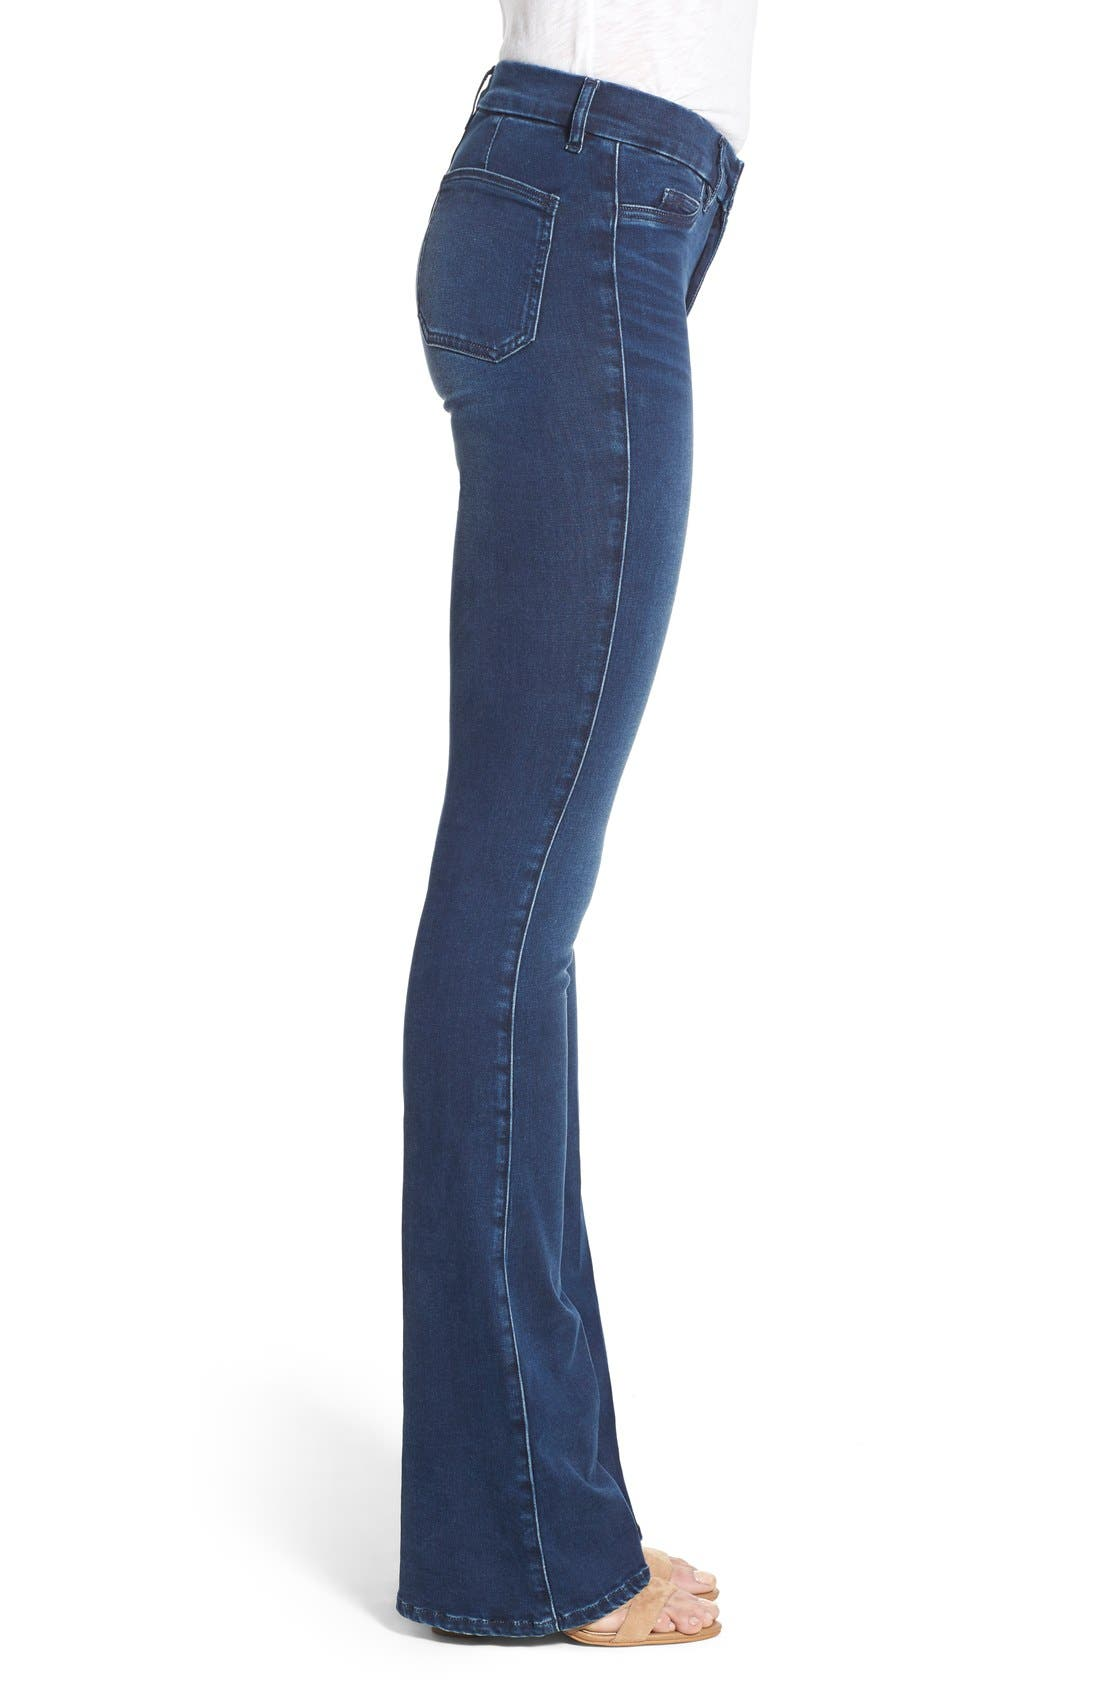 Alternate Image 3  - M.i.h. Jeans 'Superfit Marrakesh' Flare Jeans (Circle Blue)